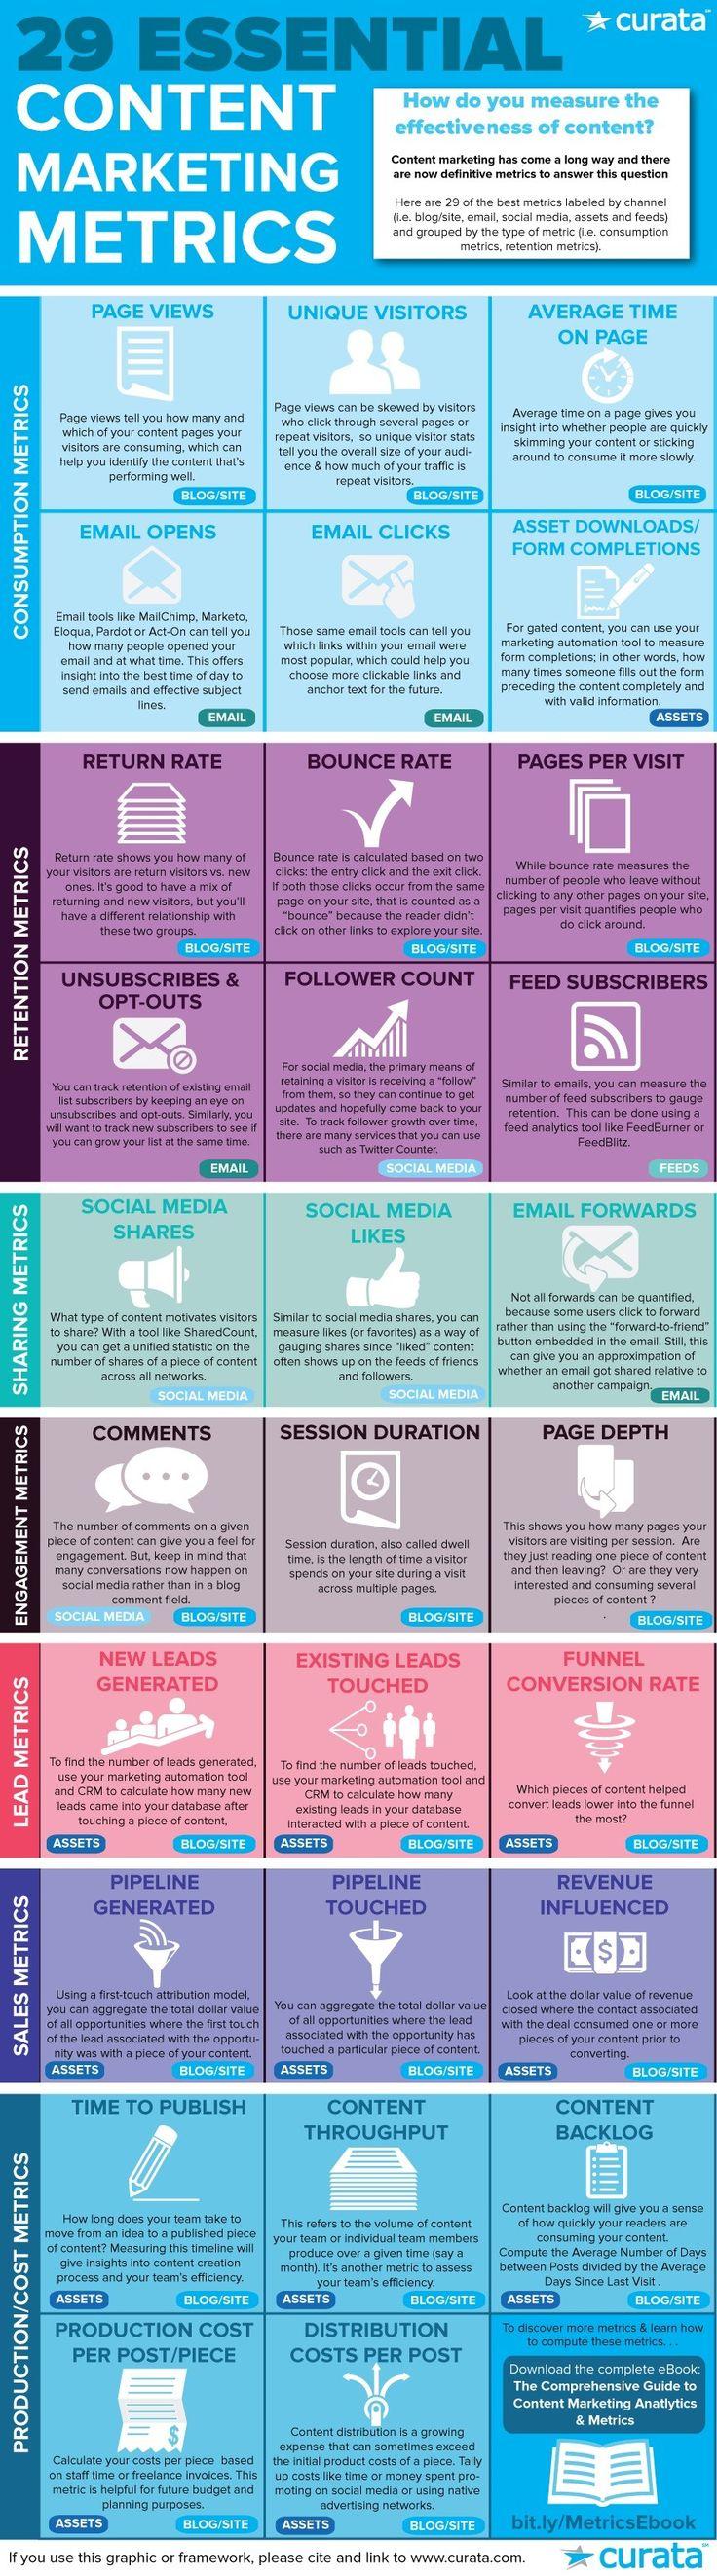 Metrics & ROI - 29 Essential Content Marketing Metrics [Infographic] : MarketingProfs Article